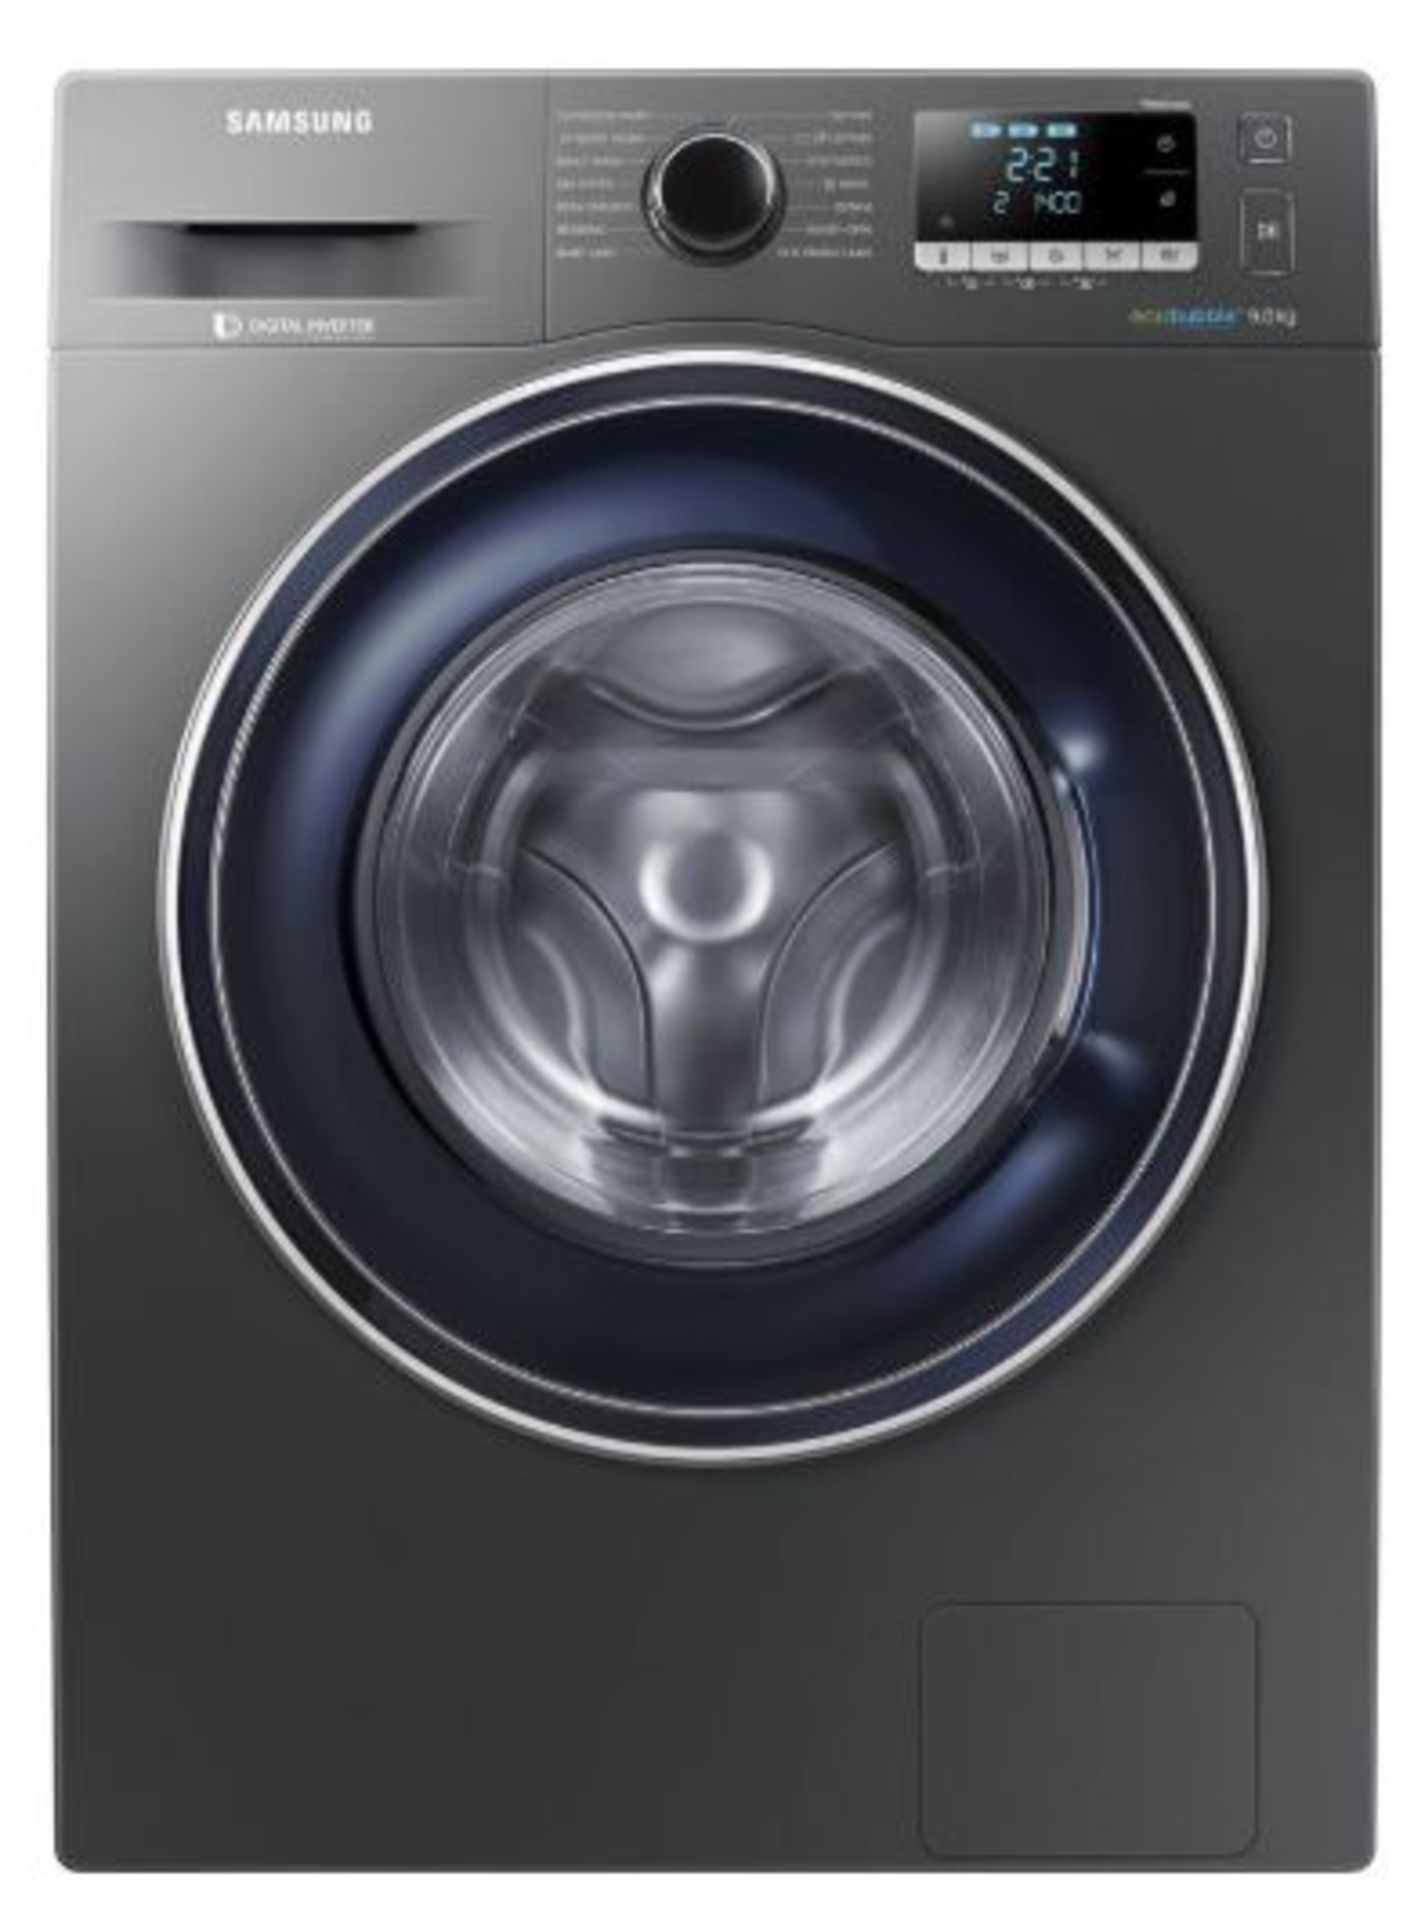 Lot 20 - Pallet of 2 Samsung Premium Washing machines. Latest selling price £738